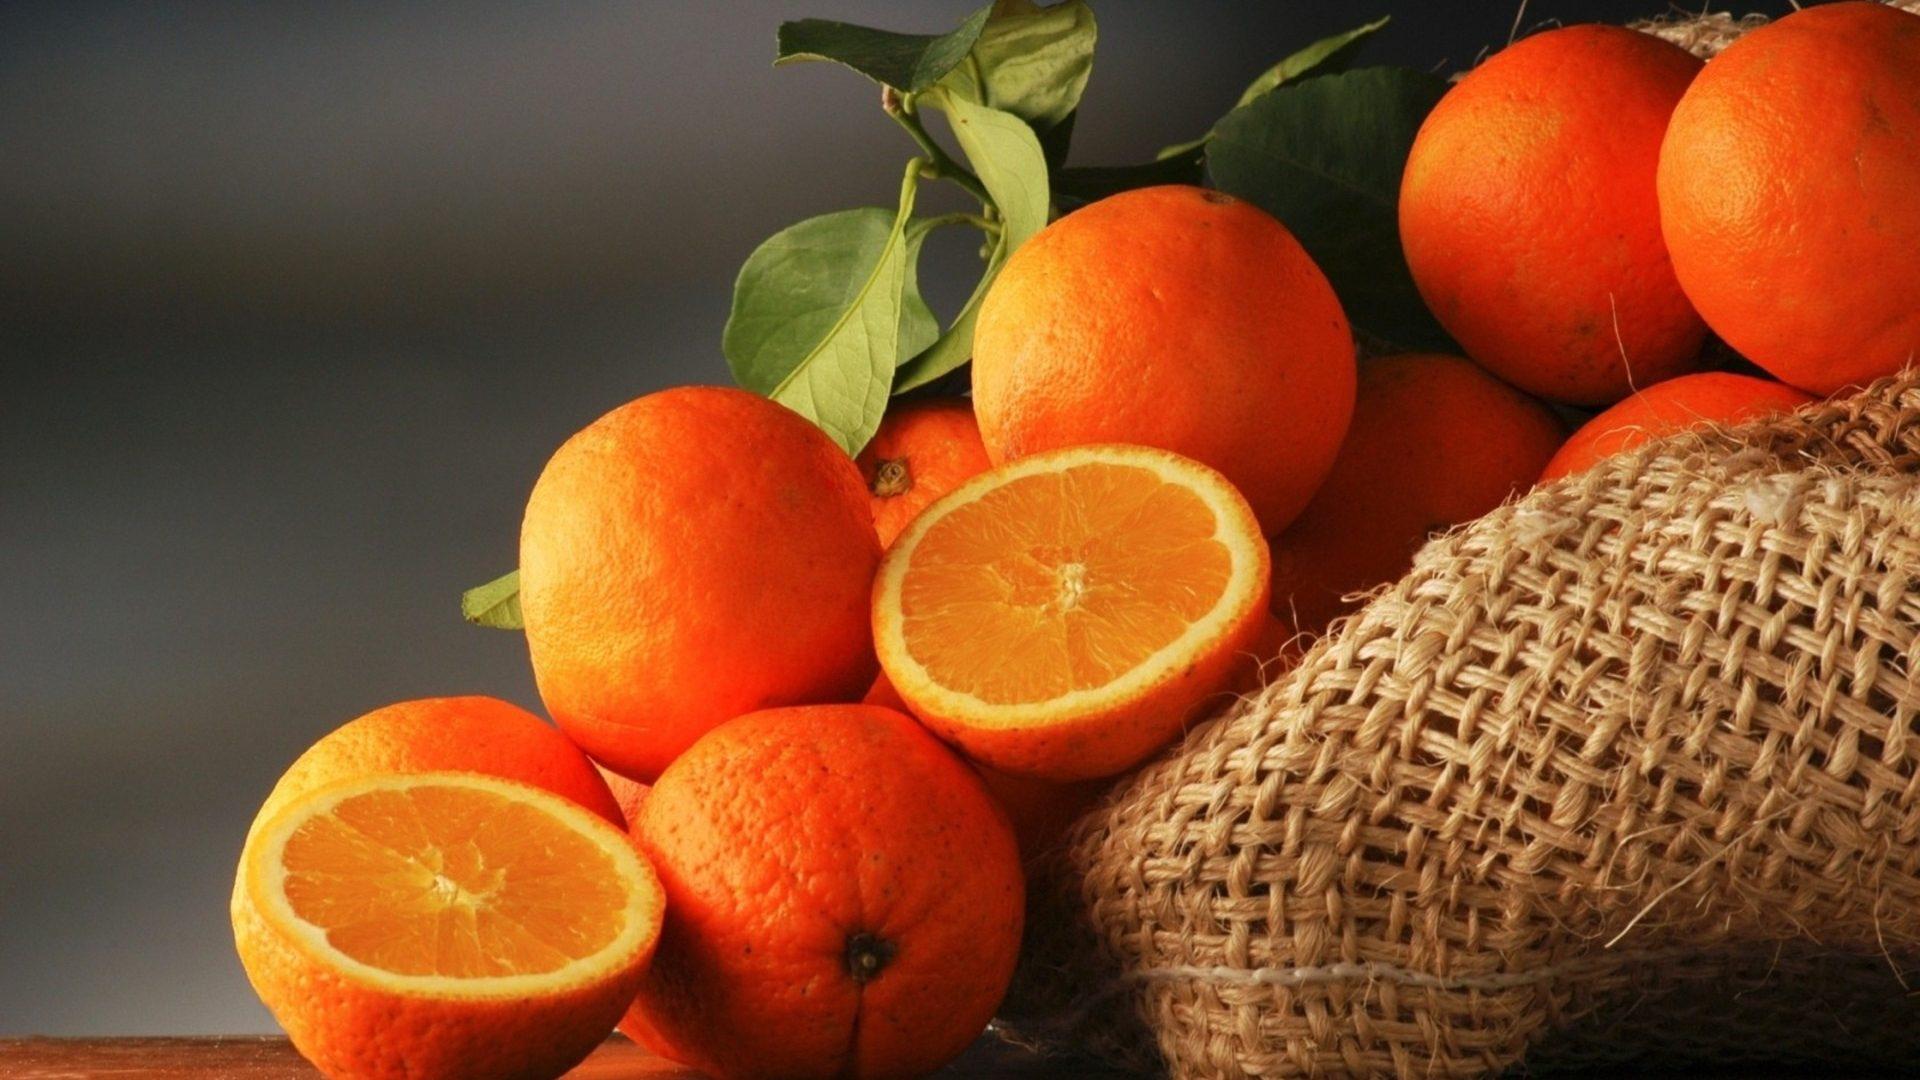 Fruits Fruit Oranges Beautiful Nature Wallpapers Hd For Desktop 1920x1080